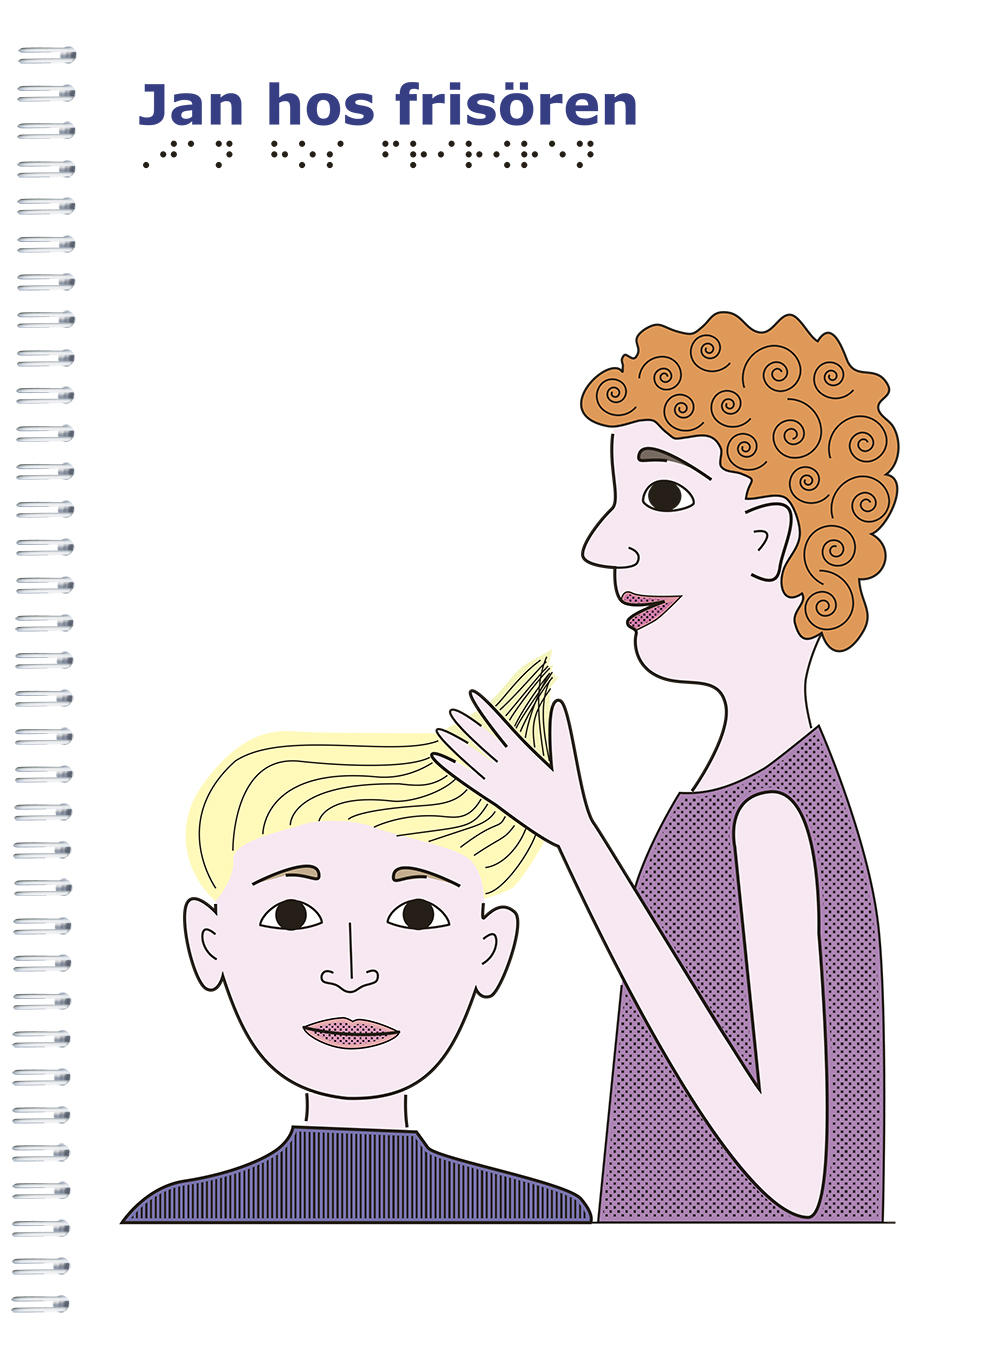 Pojke med blont hår blir friserad av en kvinna med rött lockigt hår. Vit bakgrund.